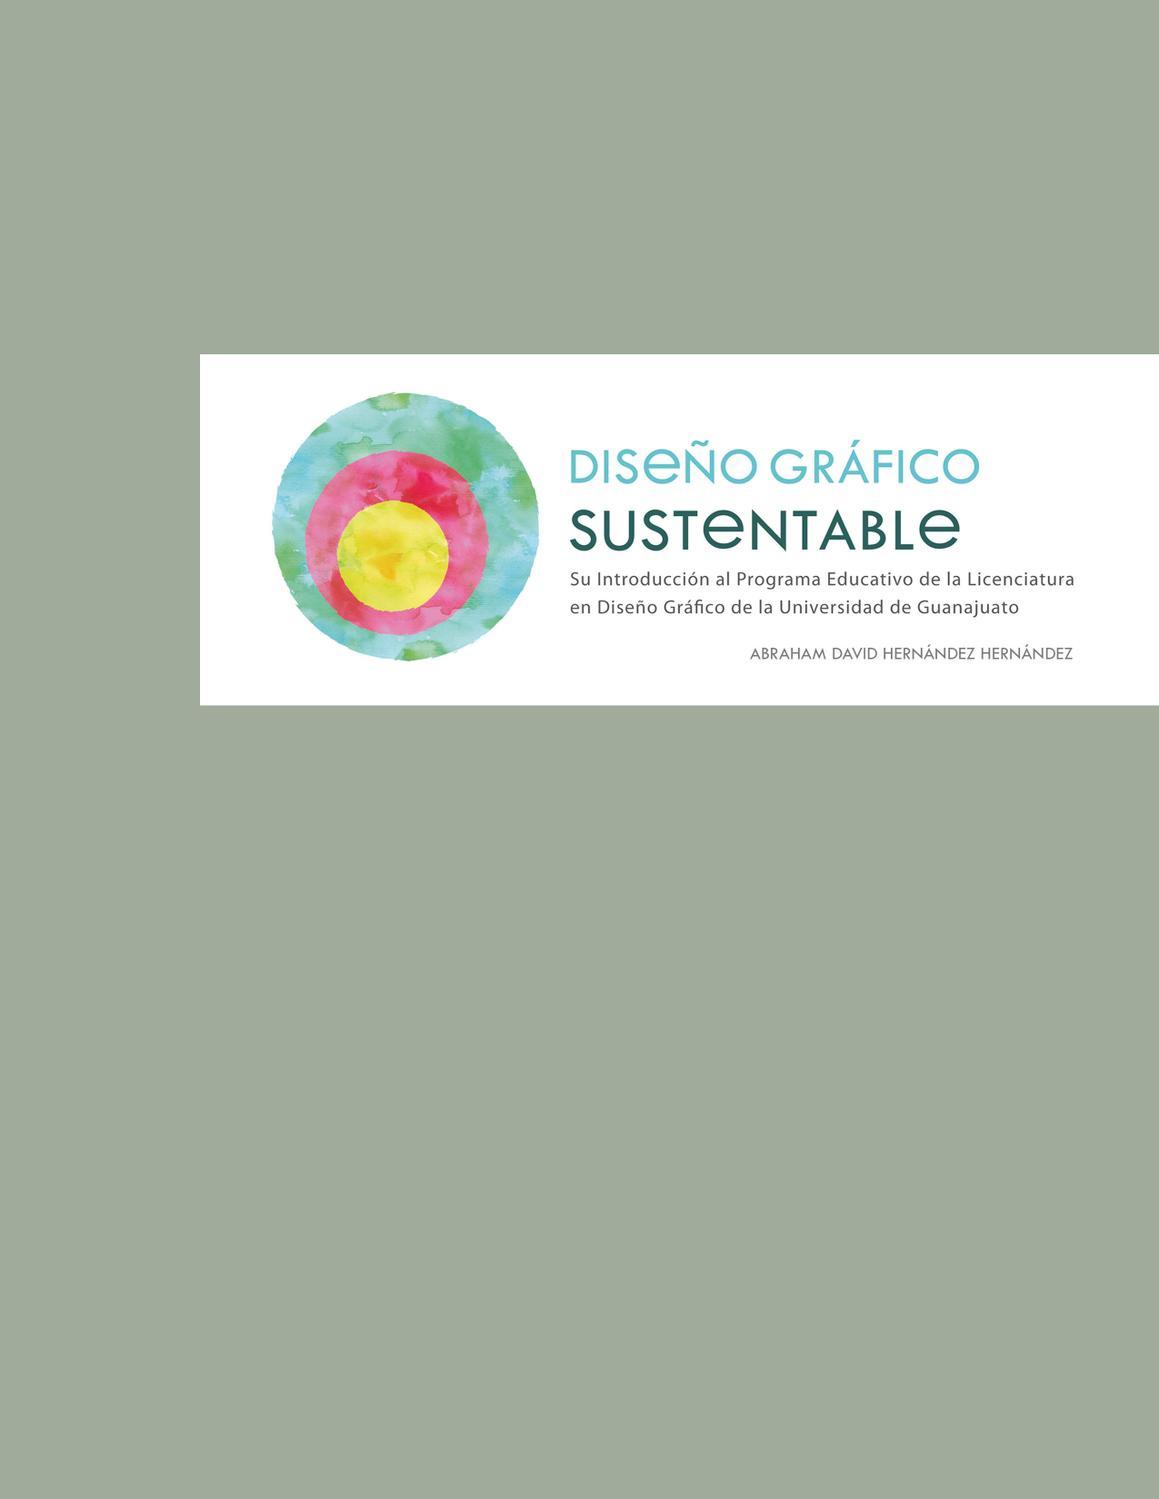 Tesis. Diseño Gráfico Sustentable. by Abraham Hdez. - issuu